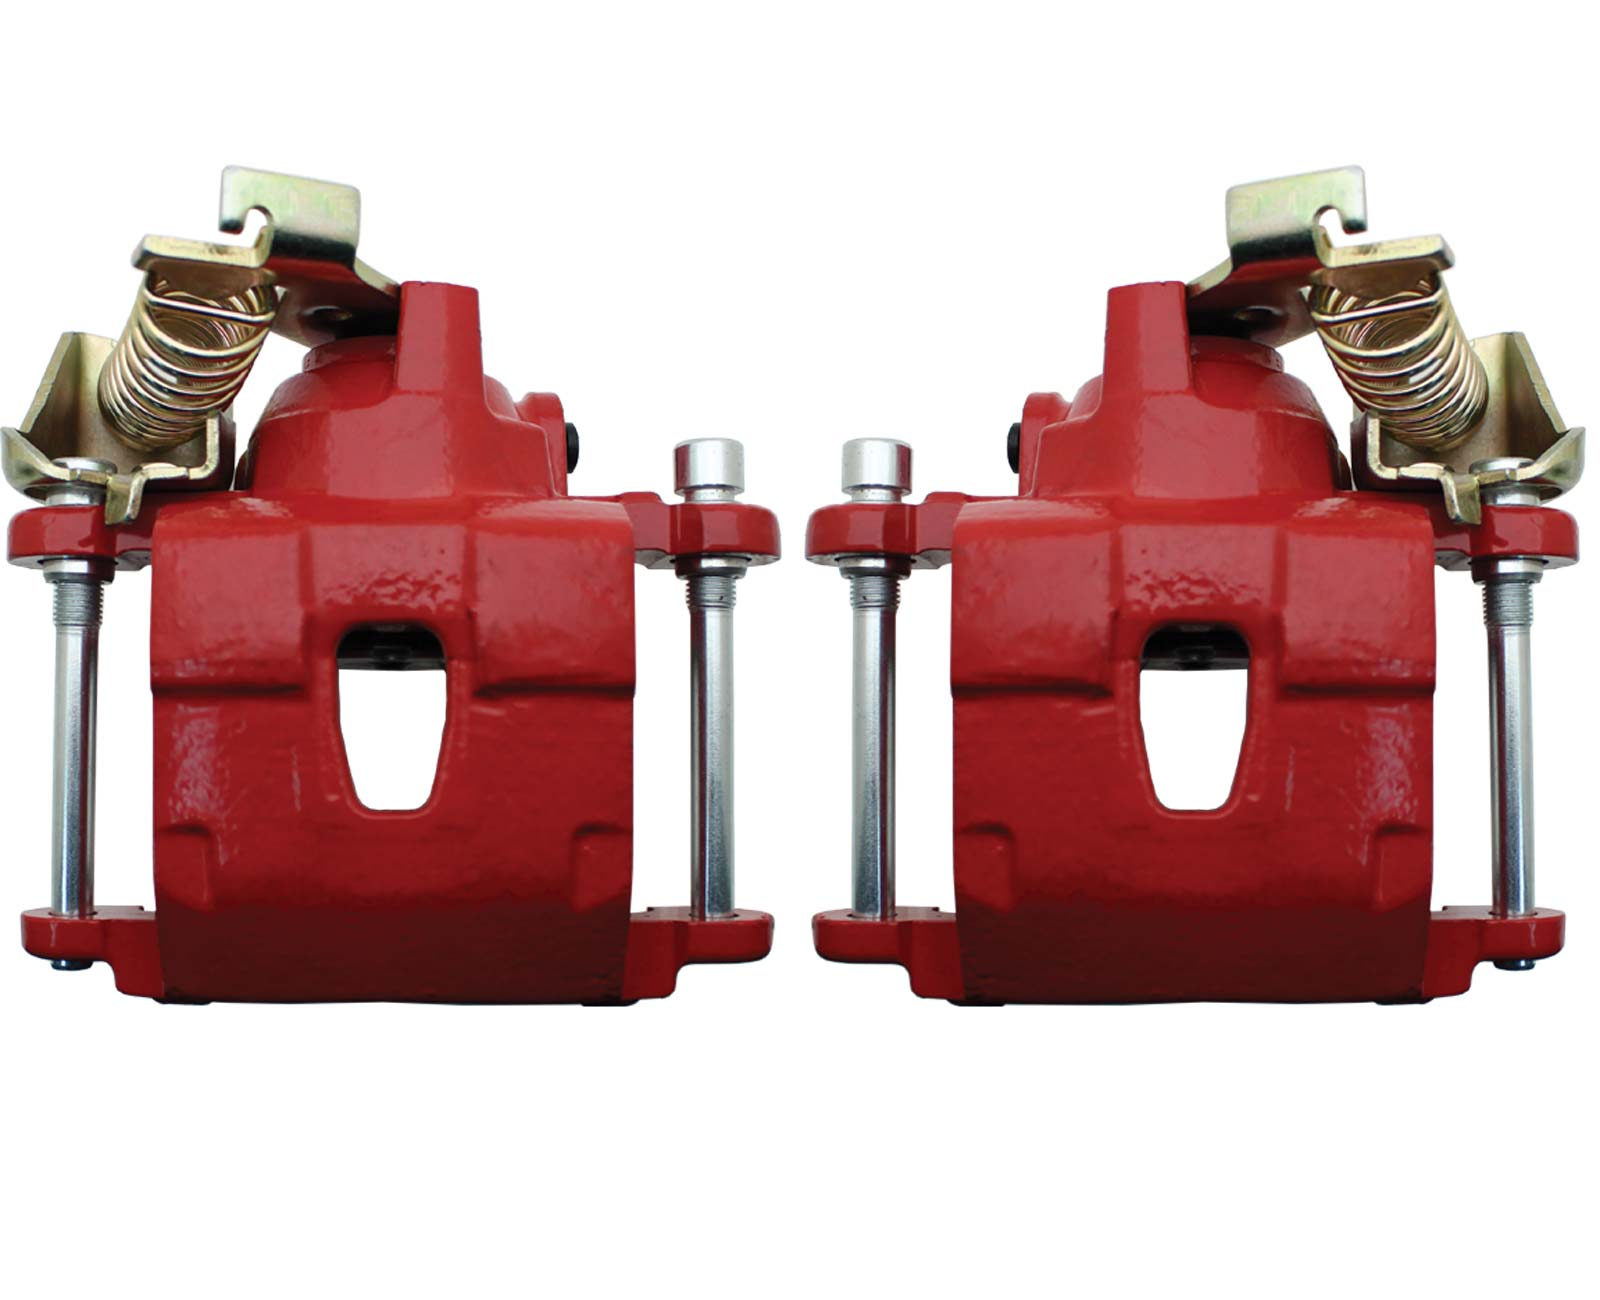 NR172-NC173PCR  GM Rear Caliper W/ E-brake Option Powder Coated Red